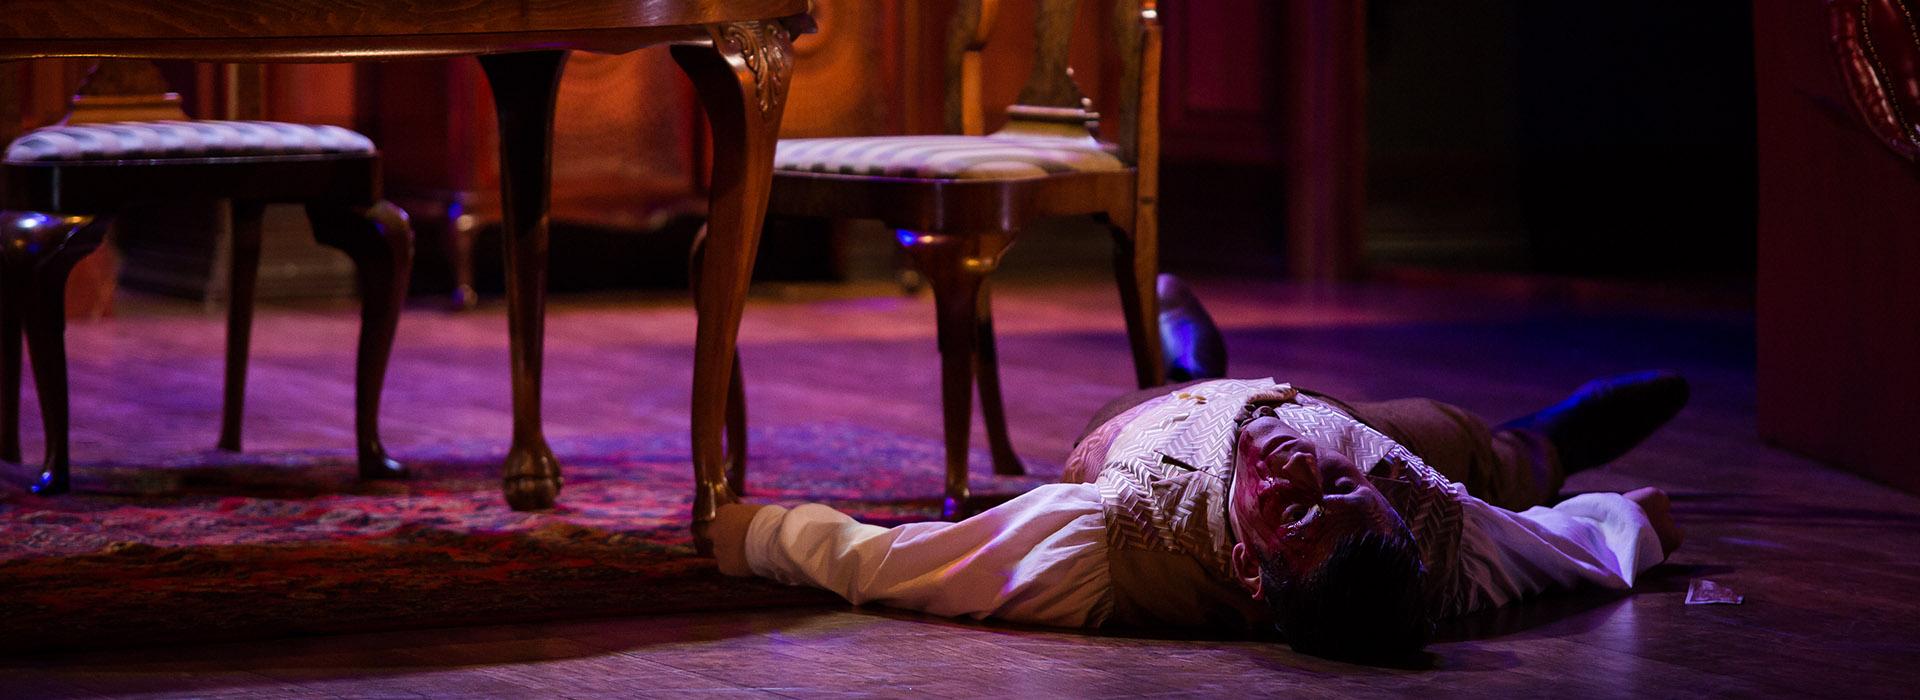 Teatr Variete Przerażony Baner